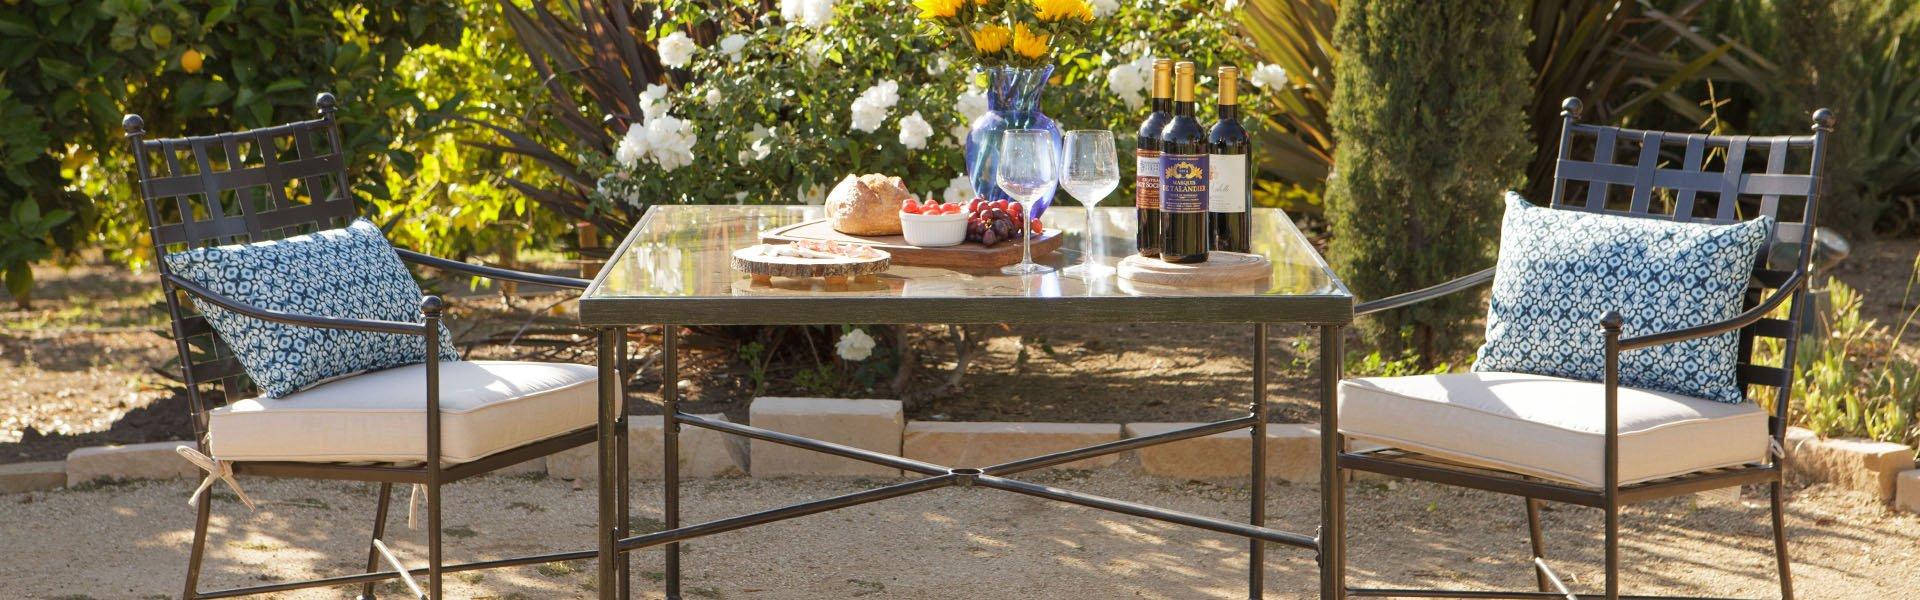 Provence-dining_1920x600.jpg